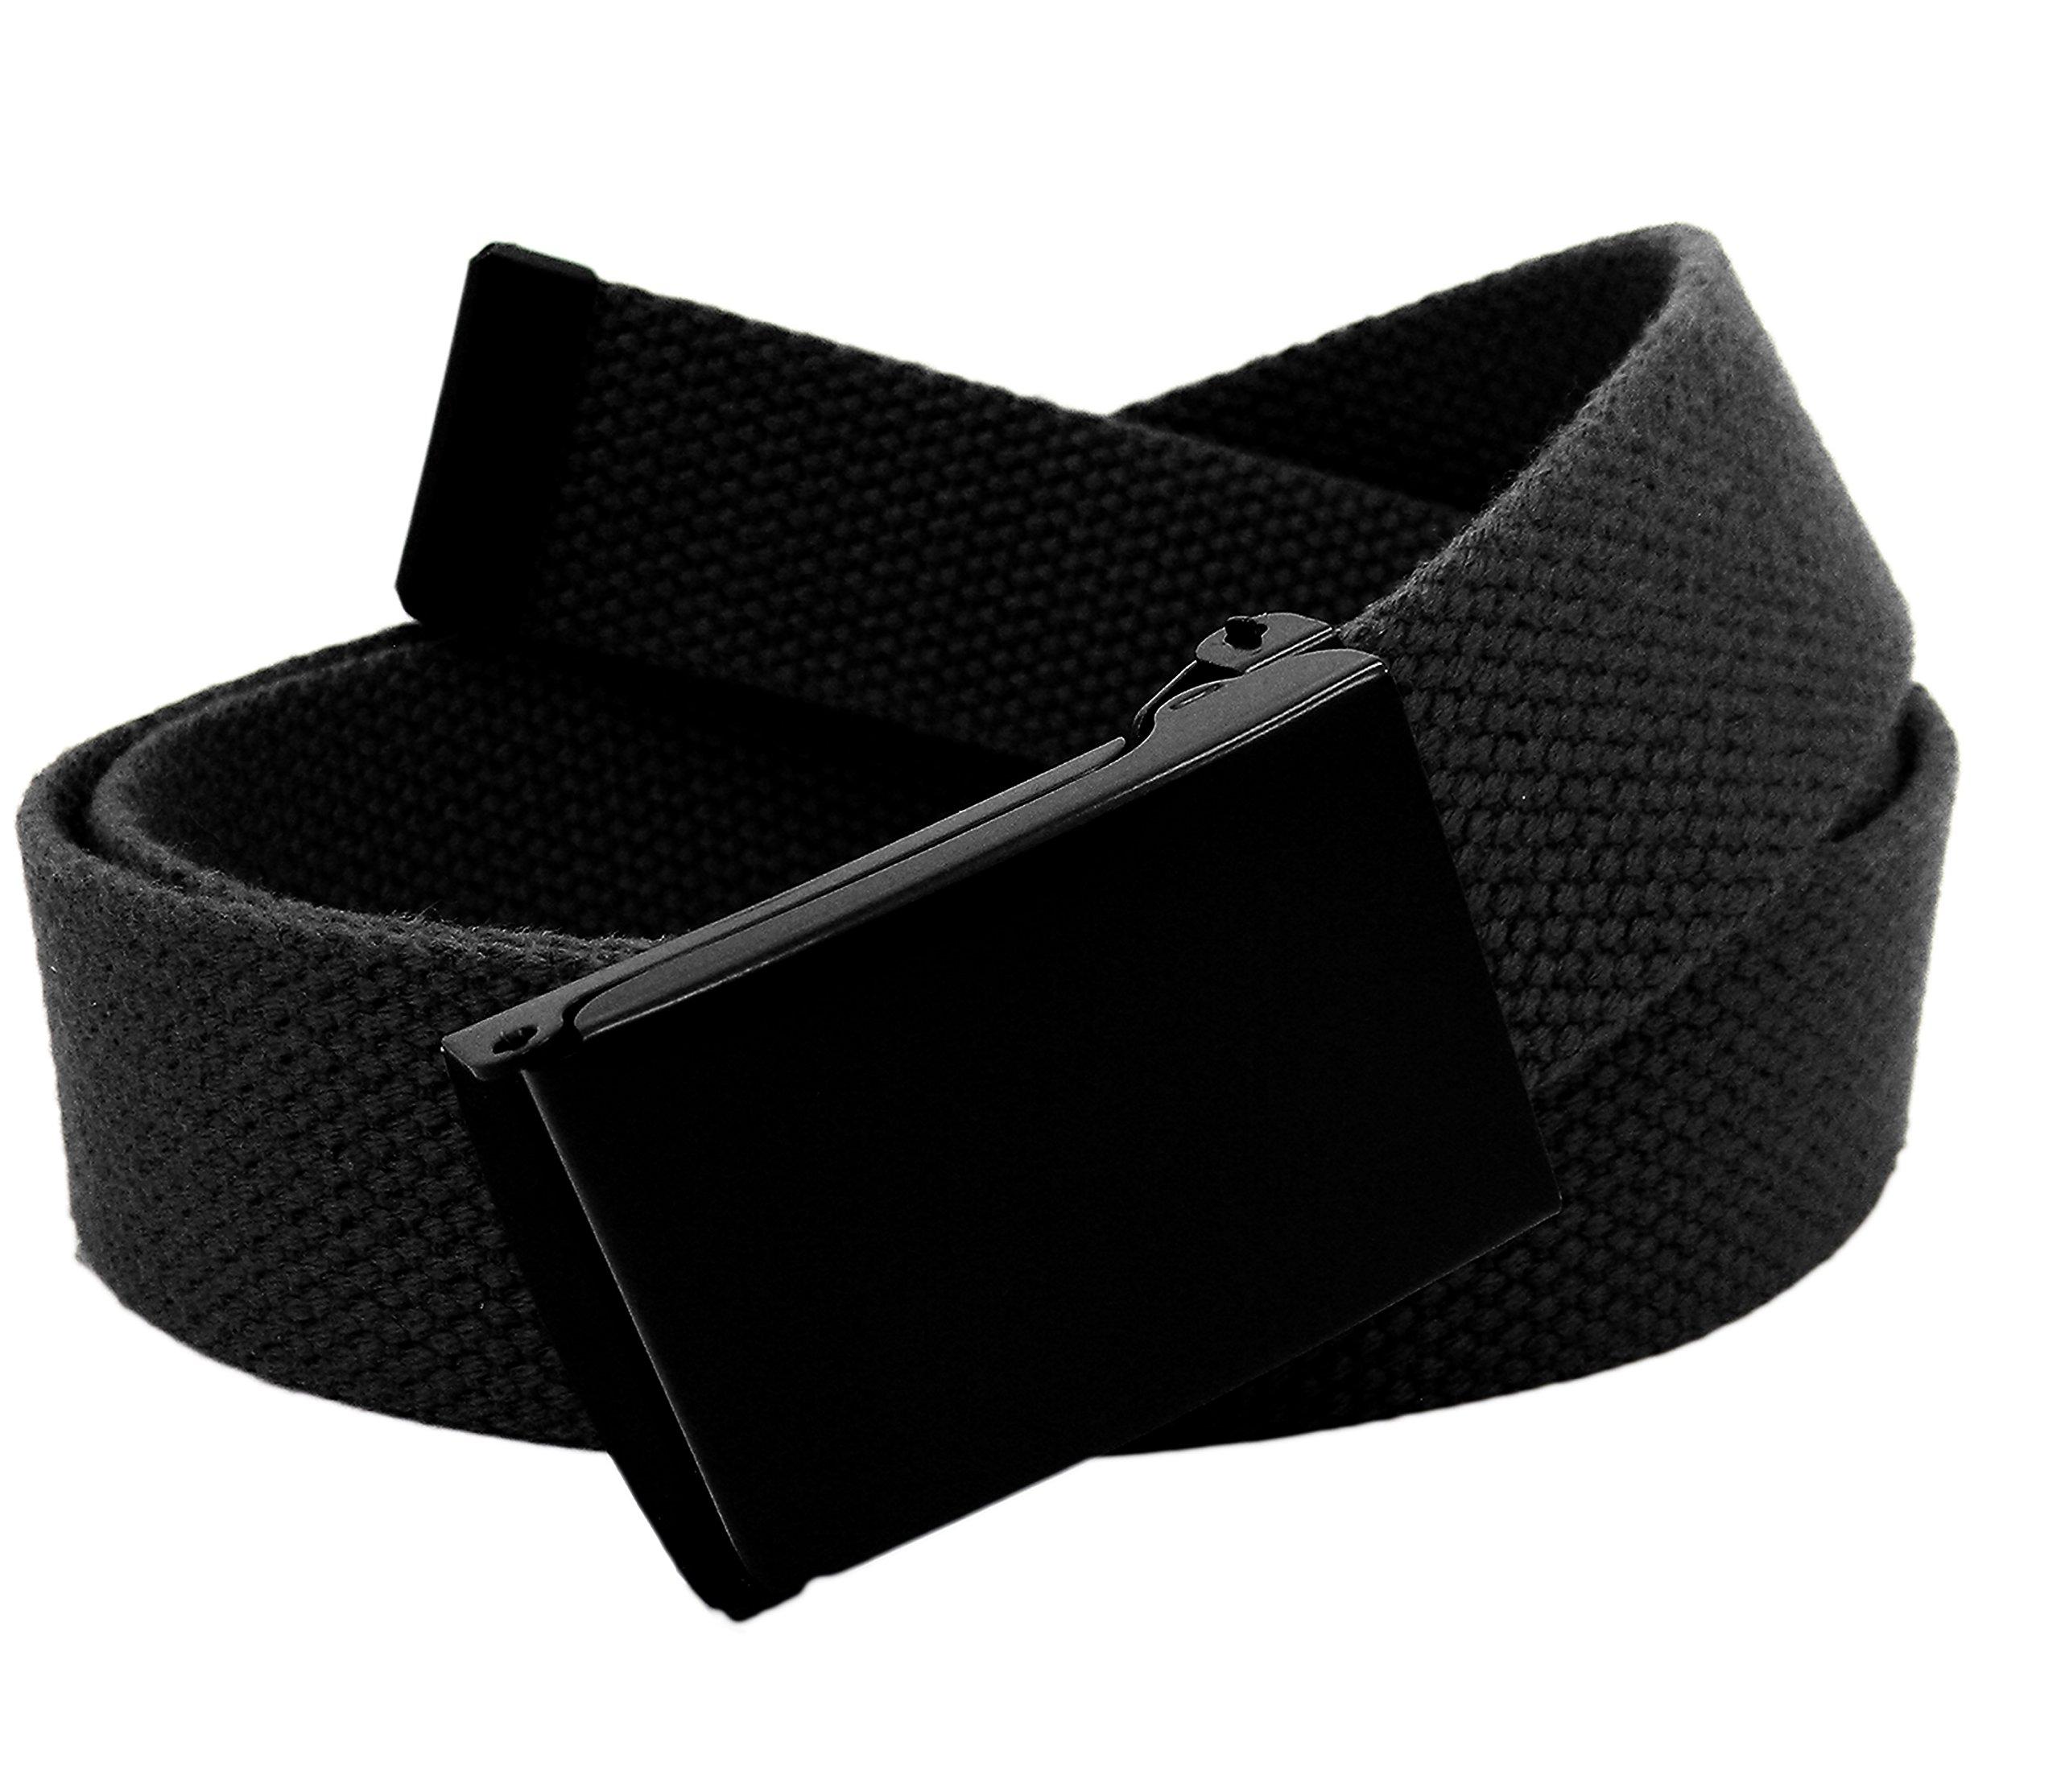 Boy's School Uniform Nickle Free Black Flip Top Military Belt Buckle with Canvas Web Belt Small Black